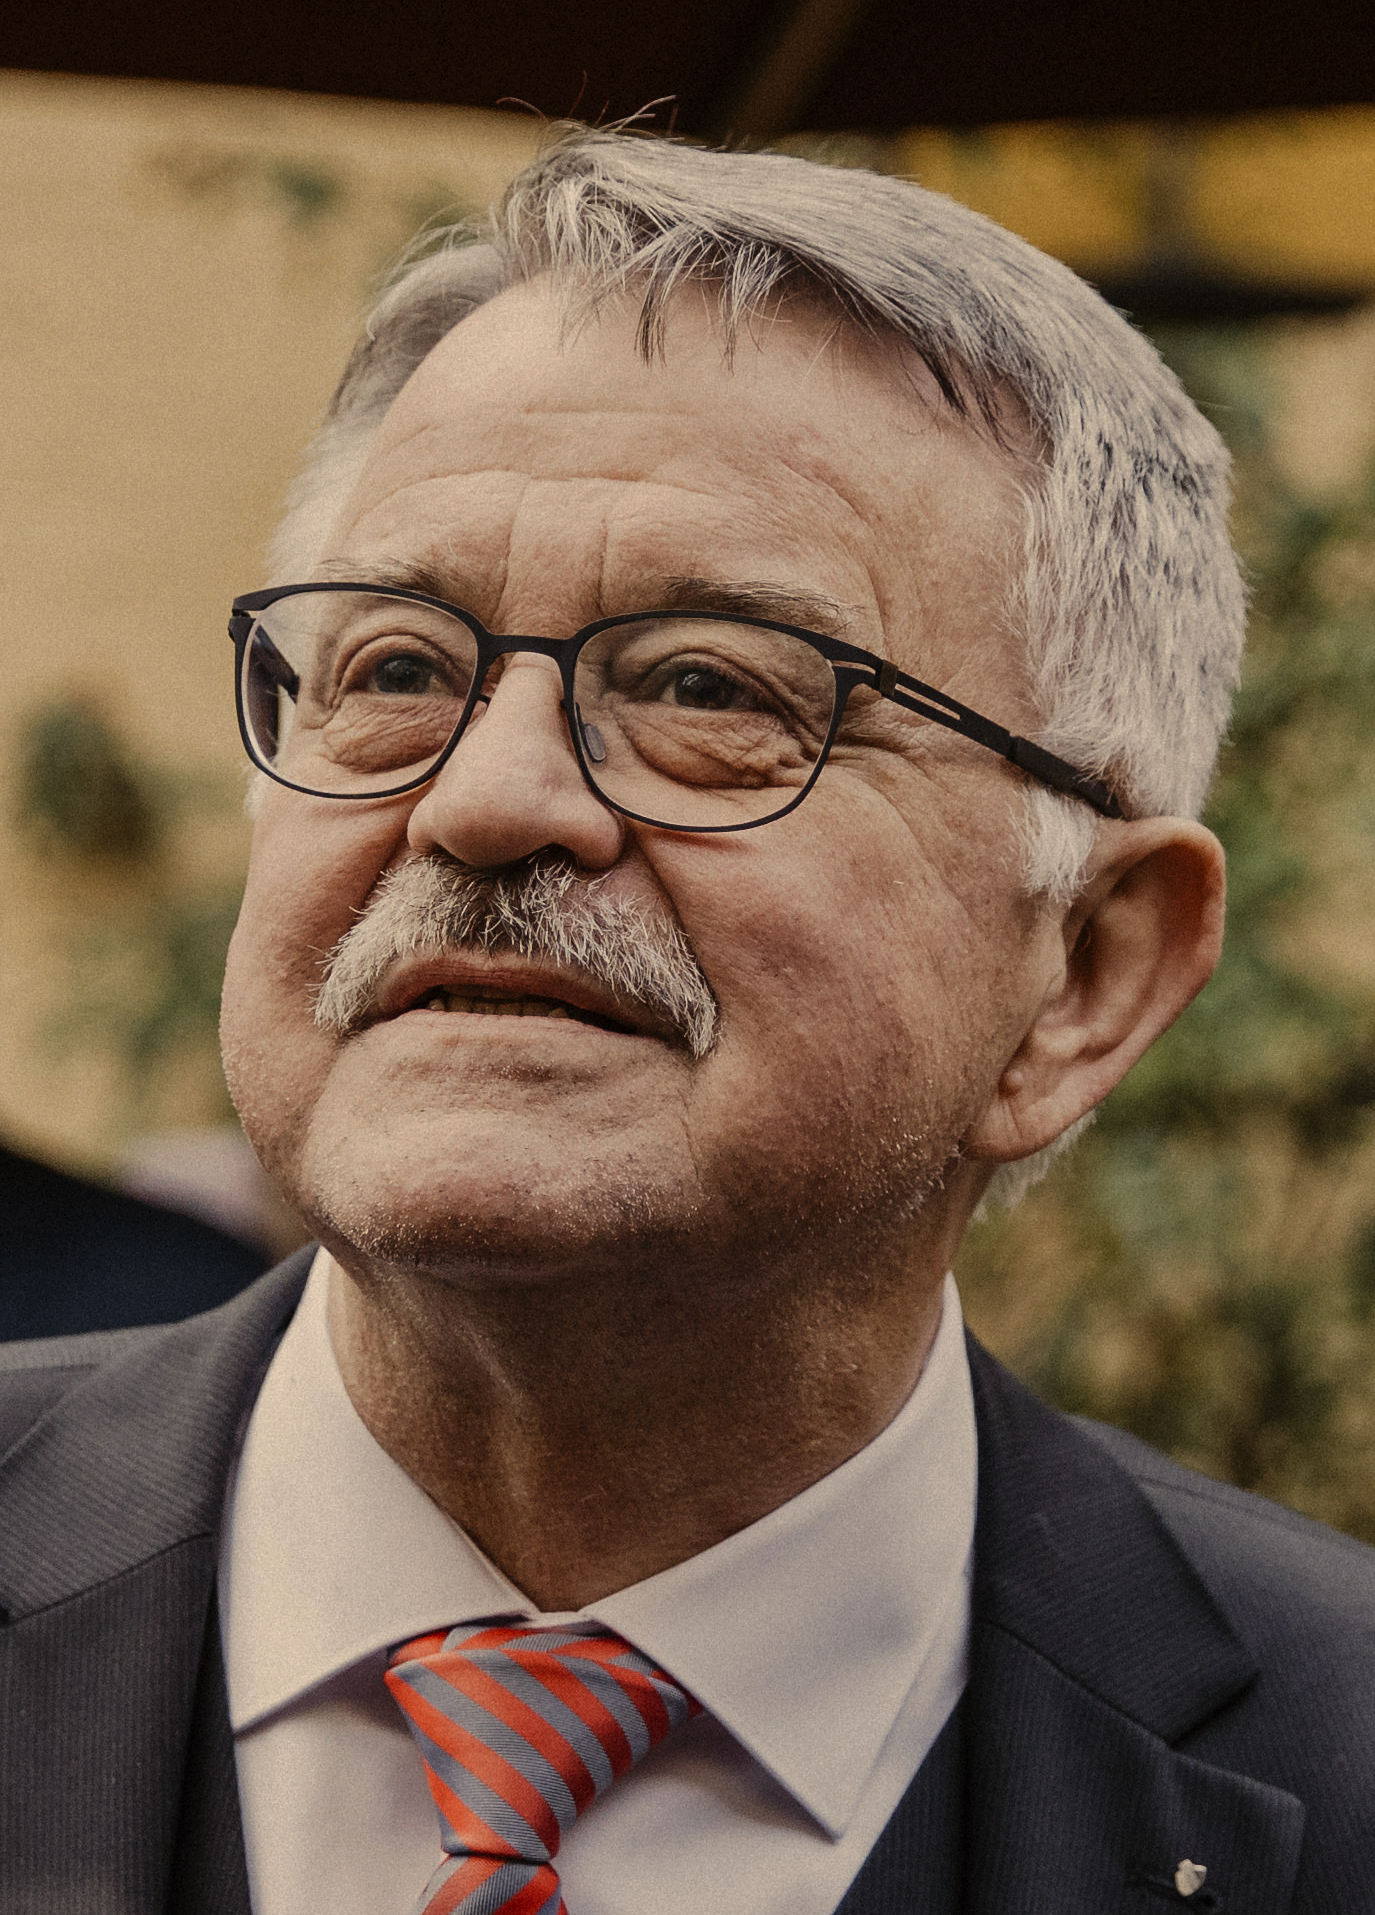 Dr. Andreas Wächtler